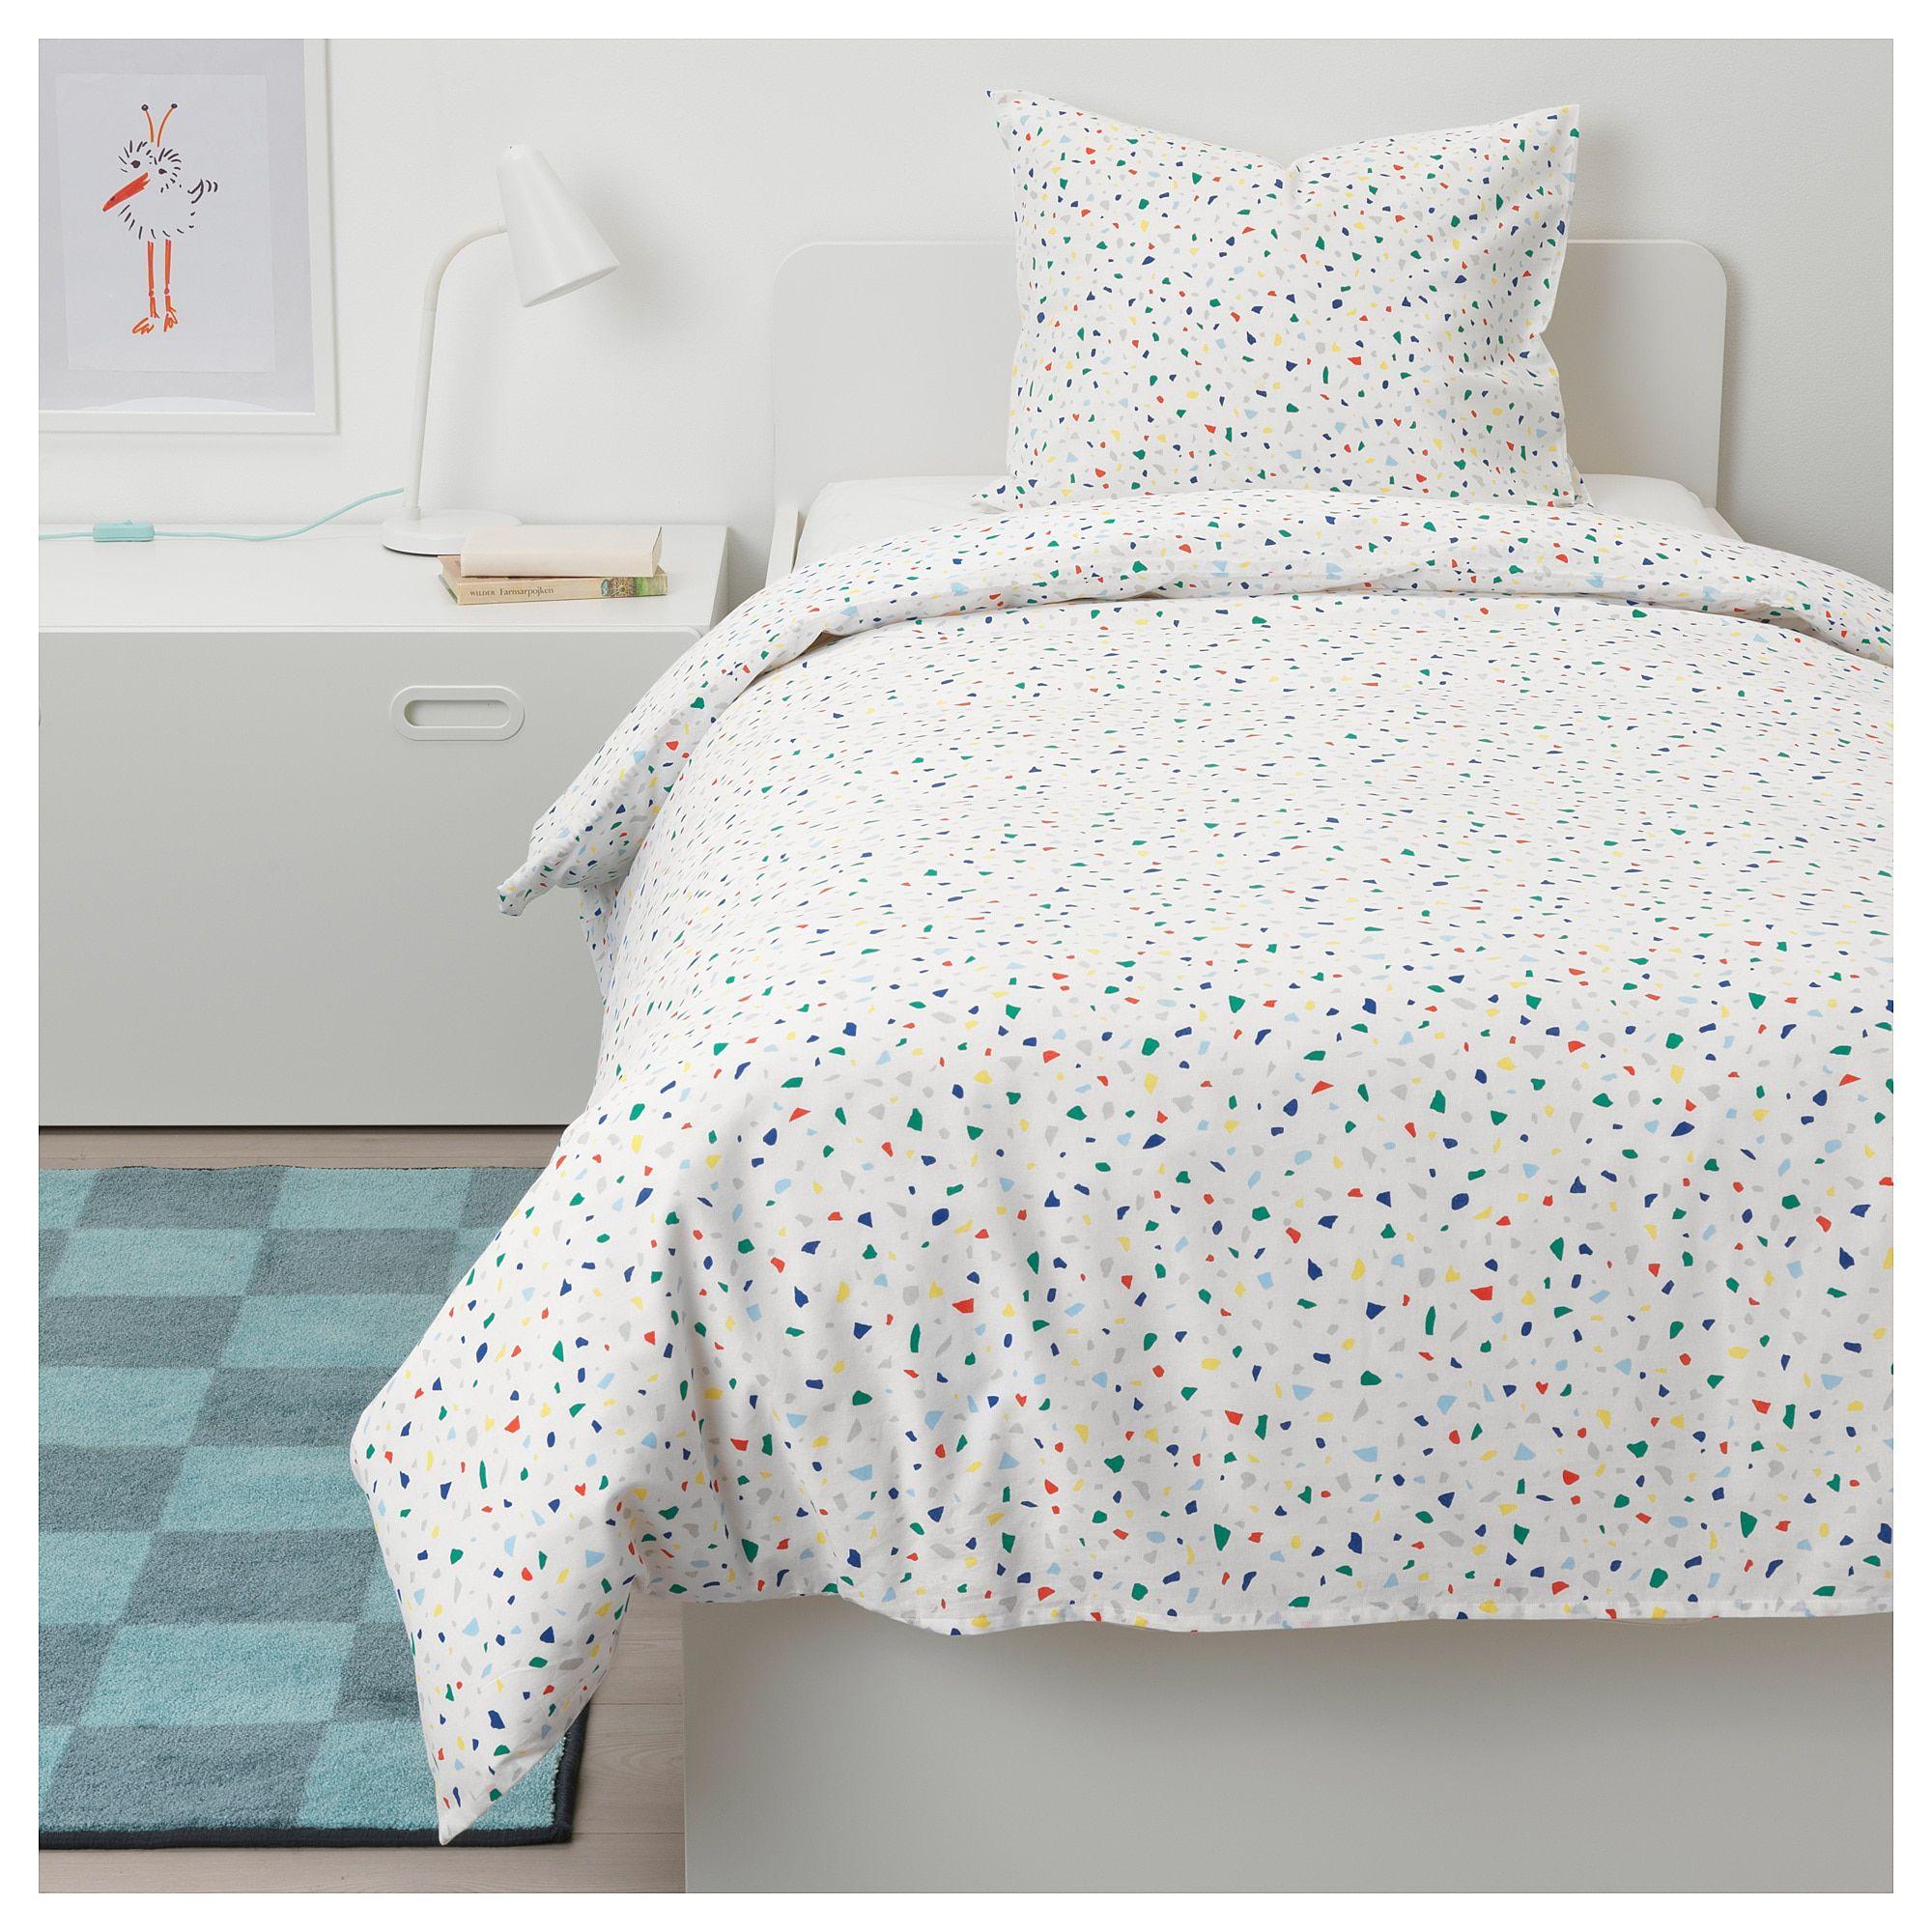 Ikea Mojlighet White Mosaic Patterned Duvet Cover And Pillowcase S Duvet Covers Ikea Bed Ikea